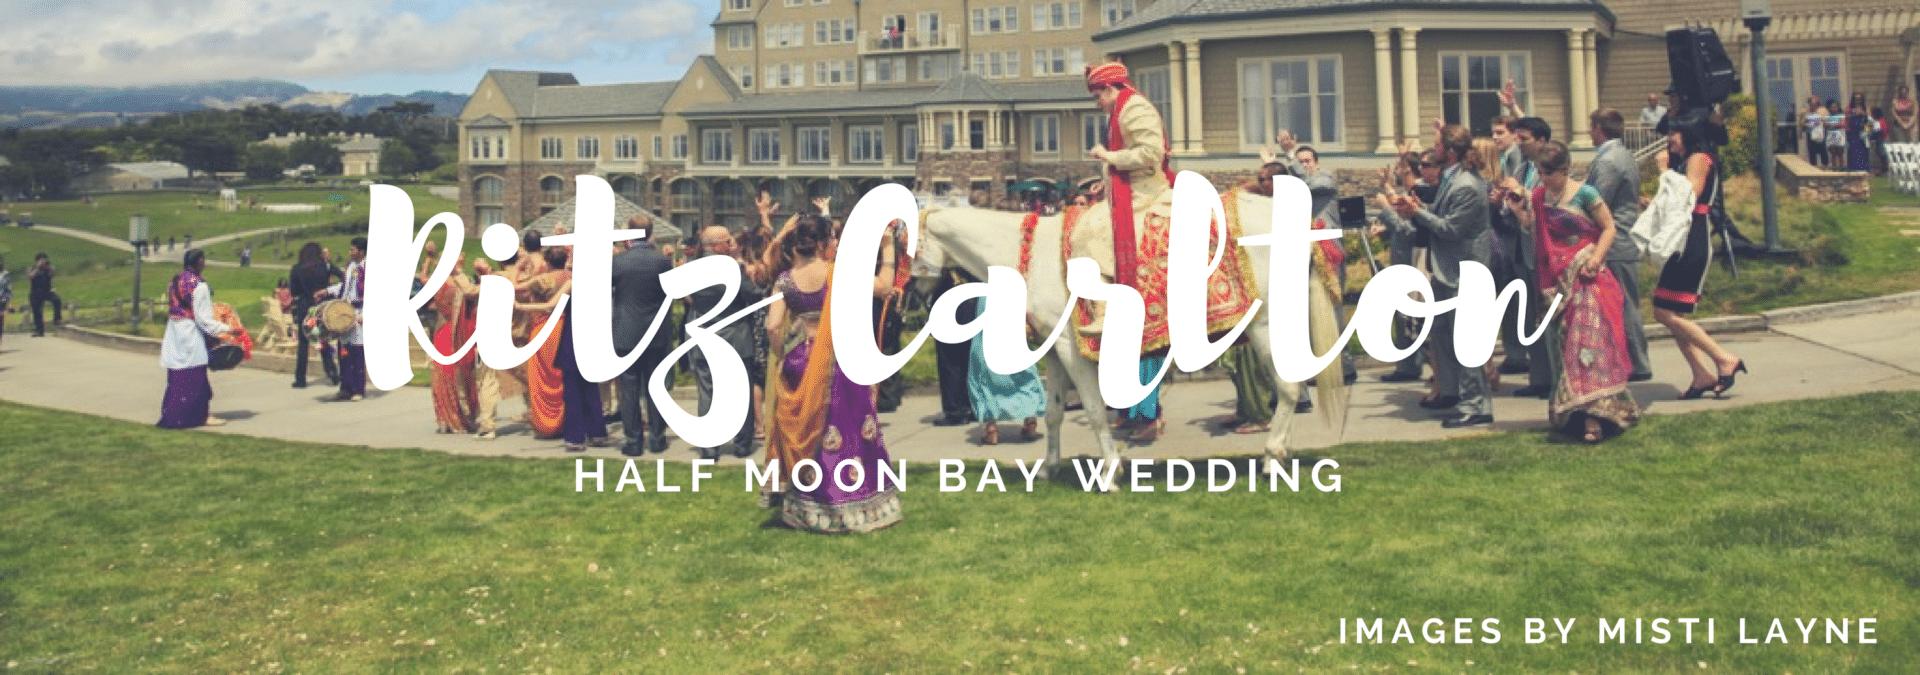 wedding at the ritz carlton half moon bay